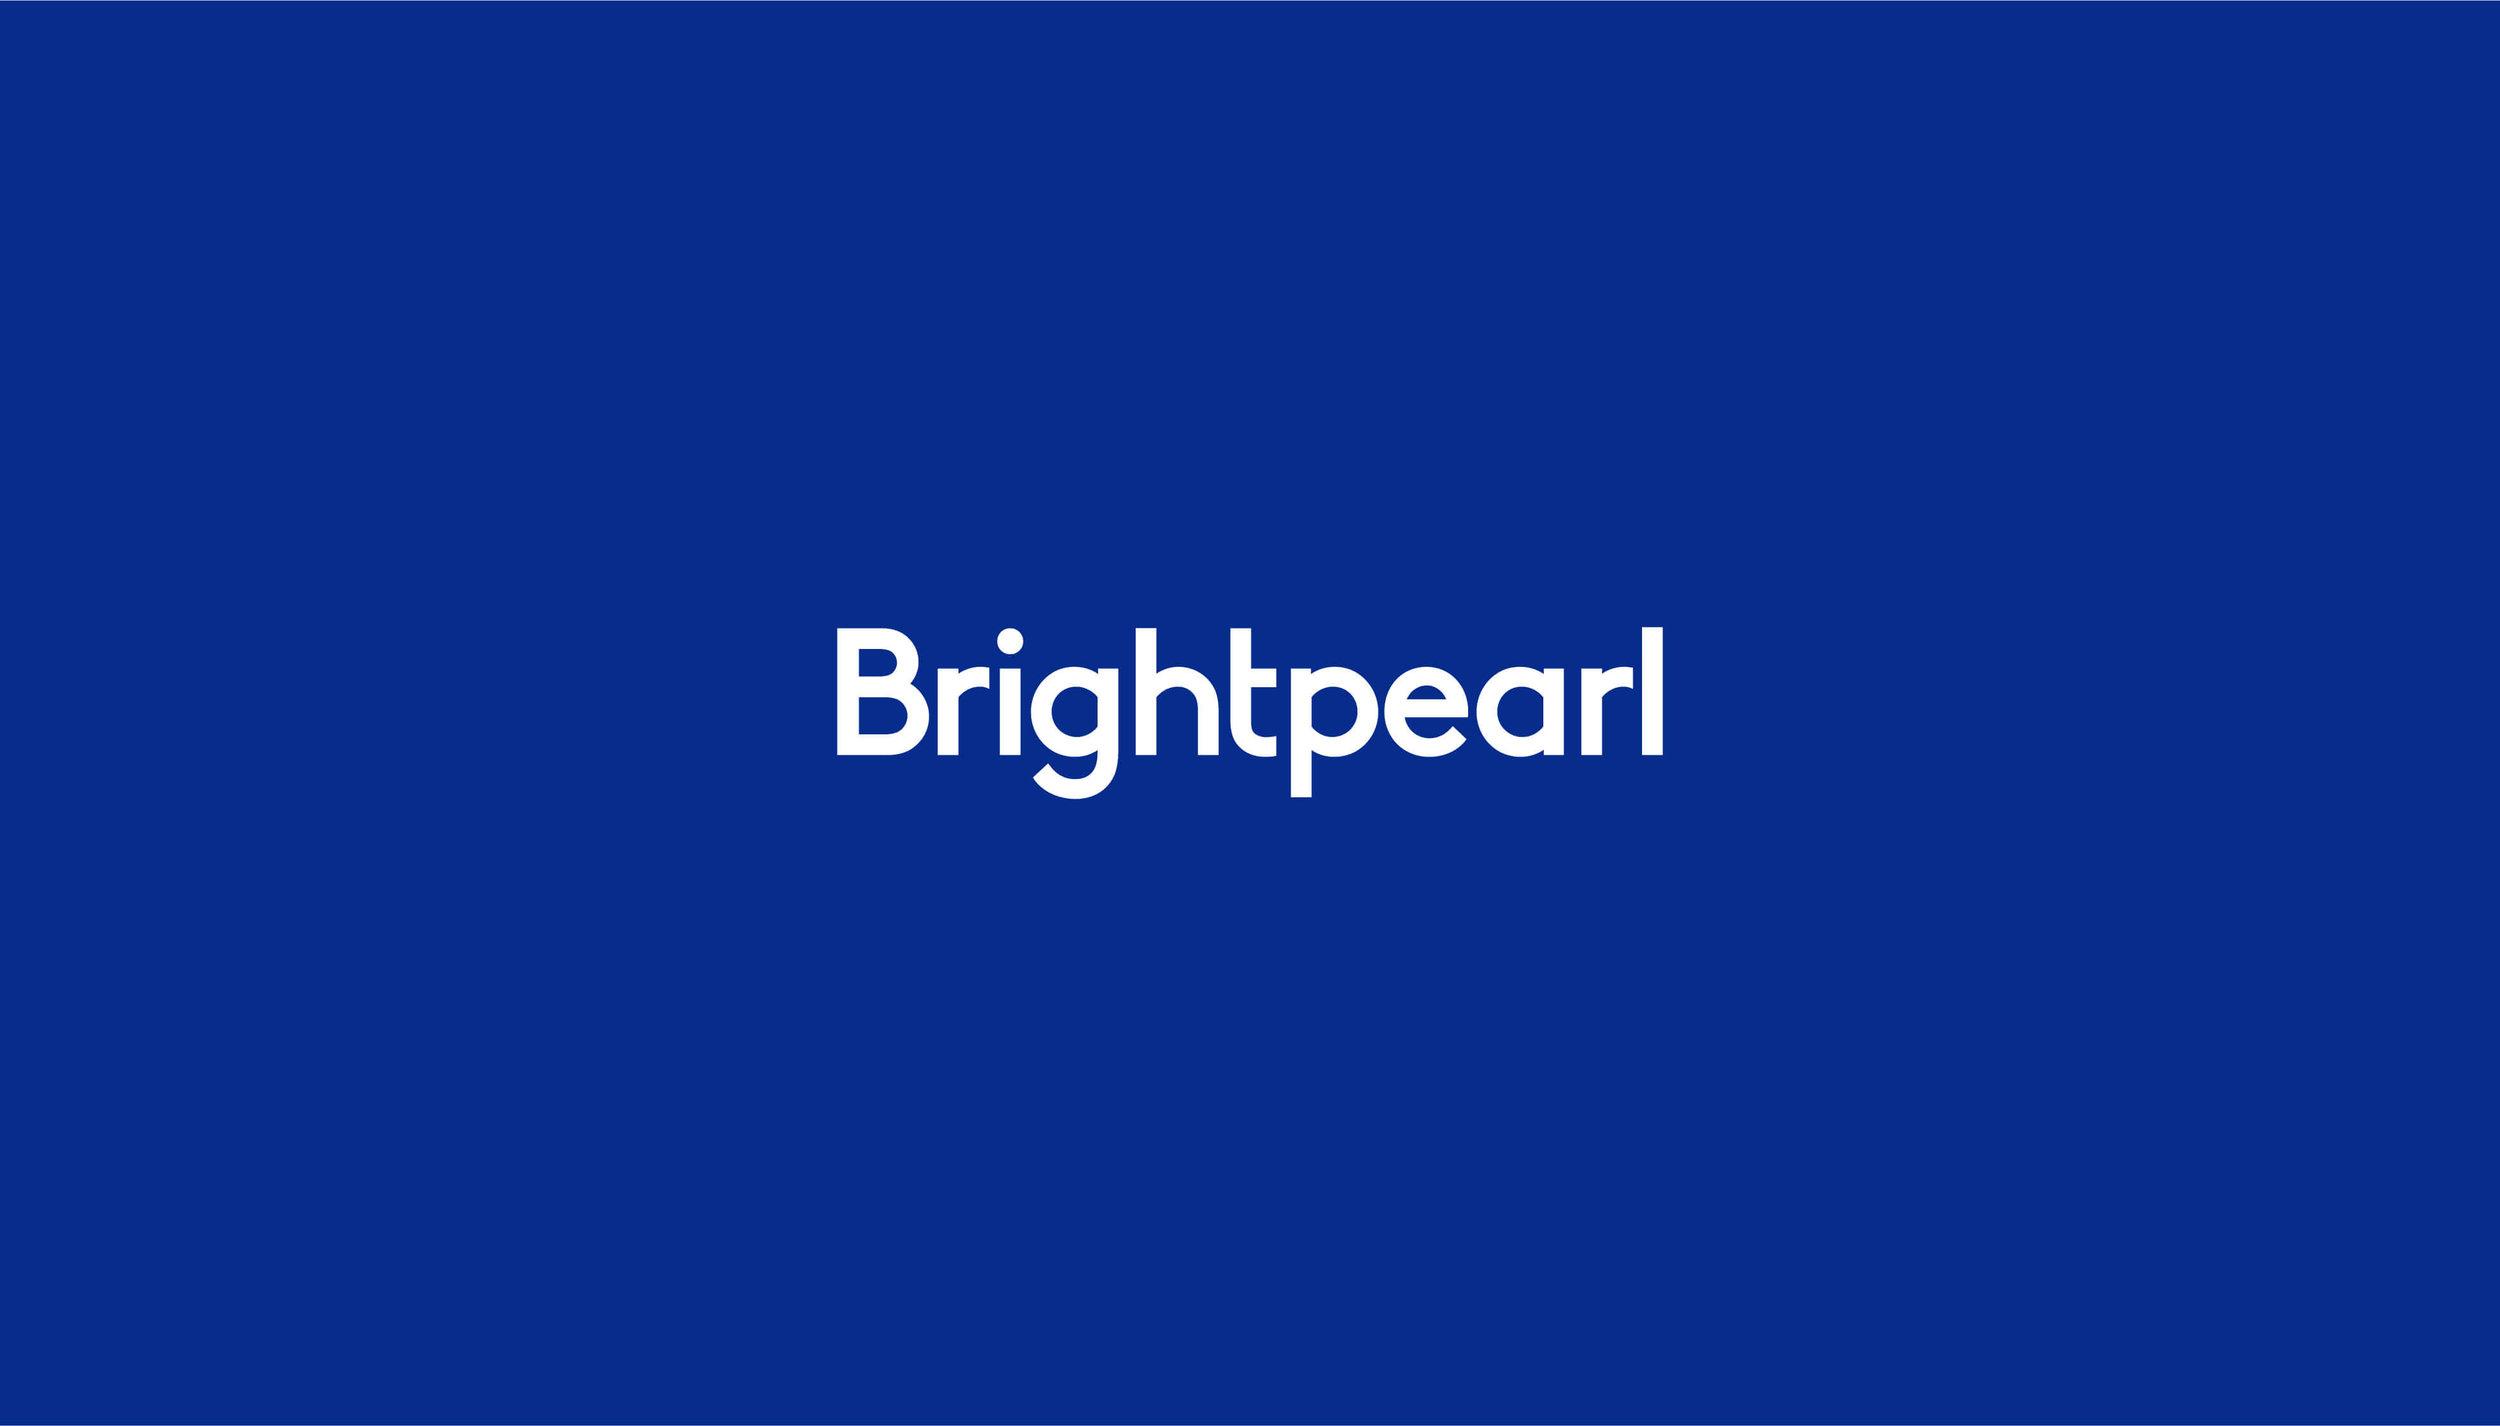 brightpearl-1